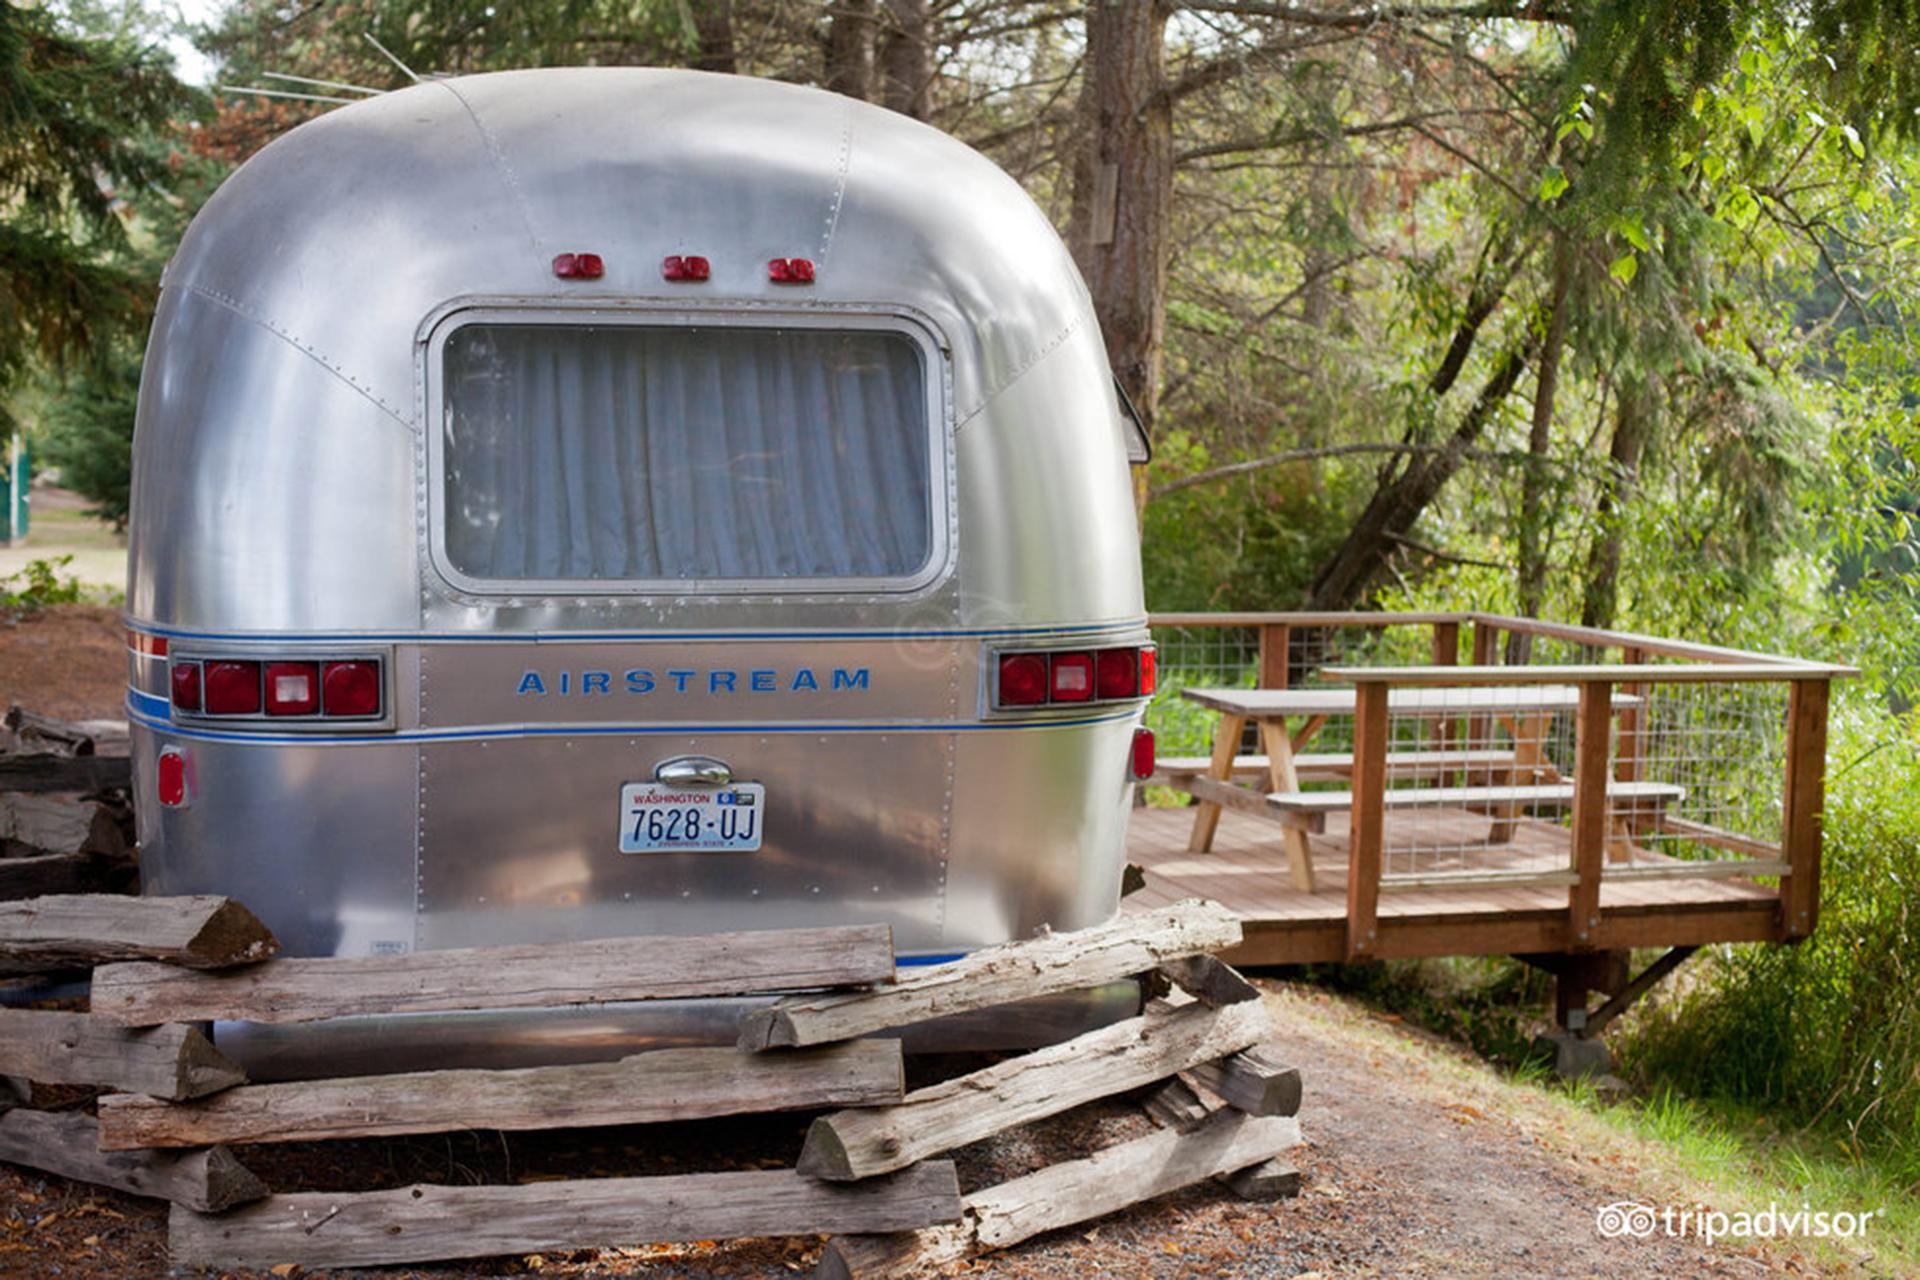 Airstream Trailer at Lakedale Resort at Three Lakes in the San Juan Island